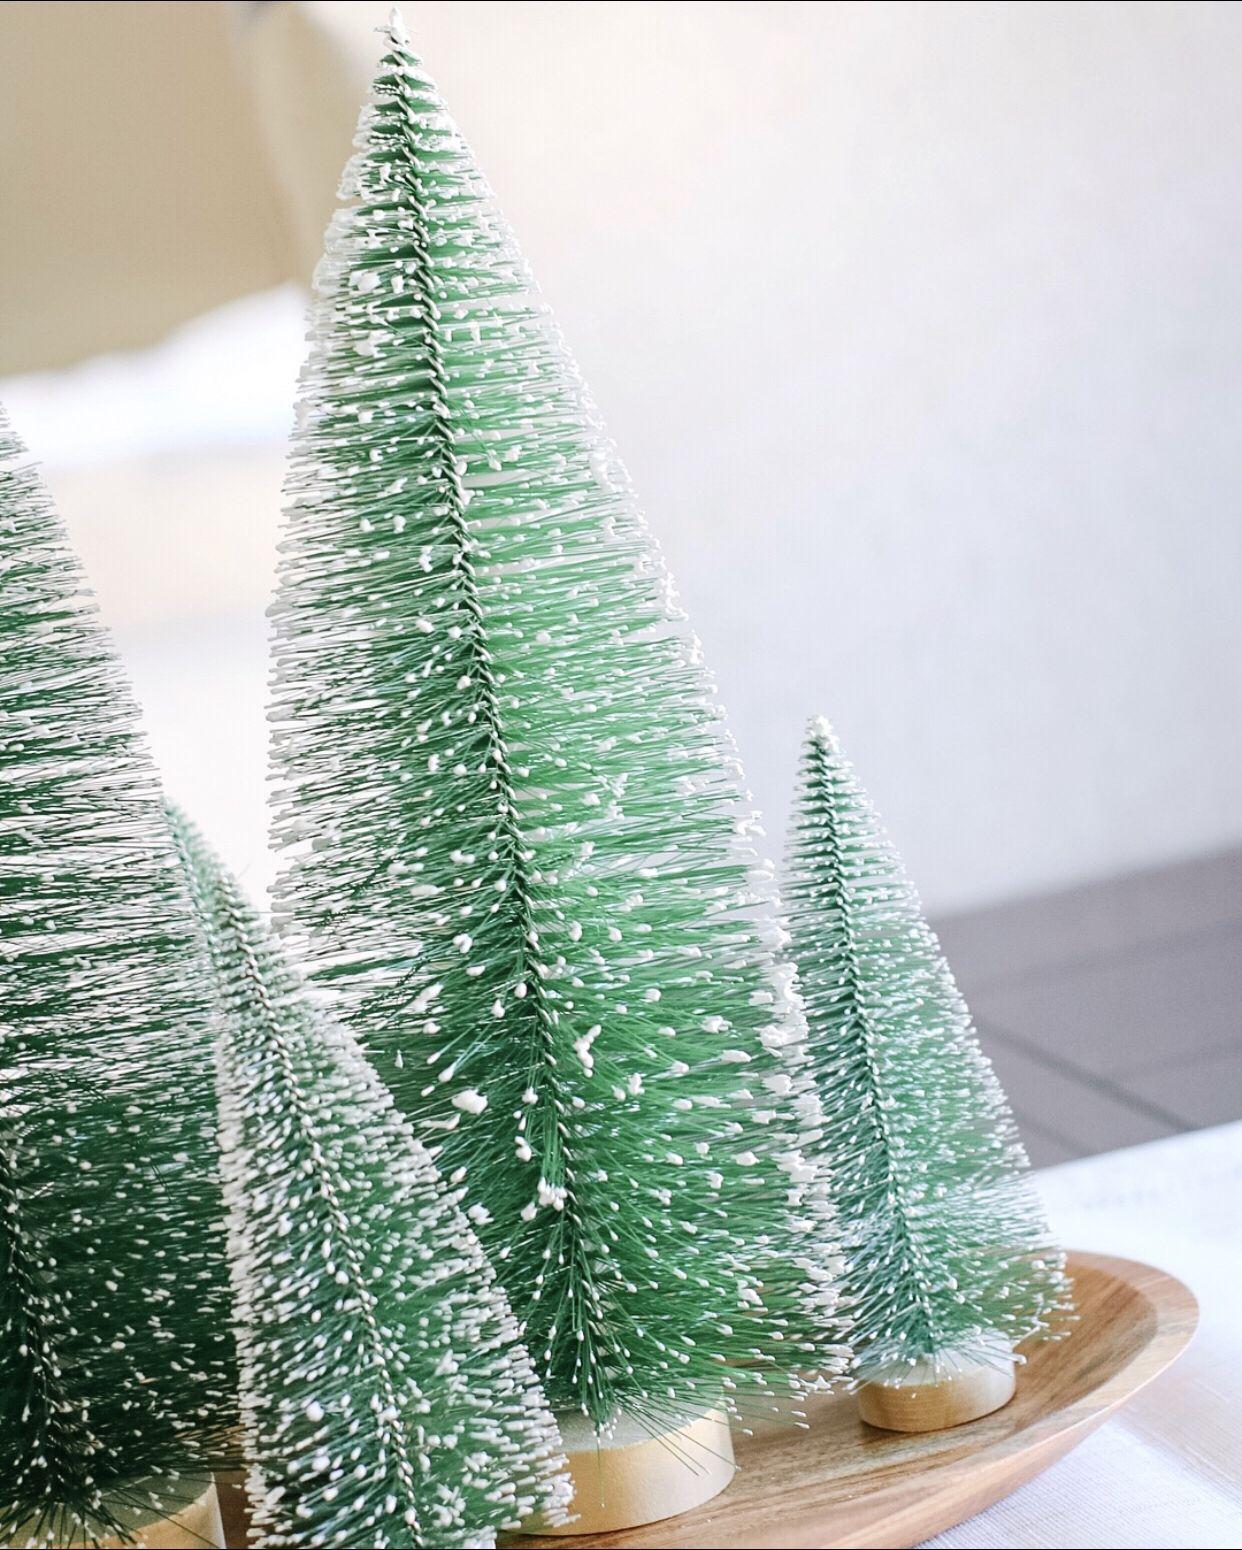 Christmas Christmas Decorations Bottle Brush Christmas Trees Christmas Tree Decorations